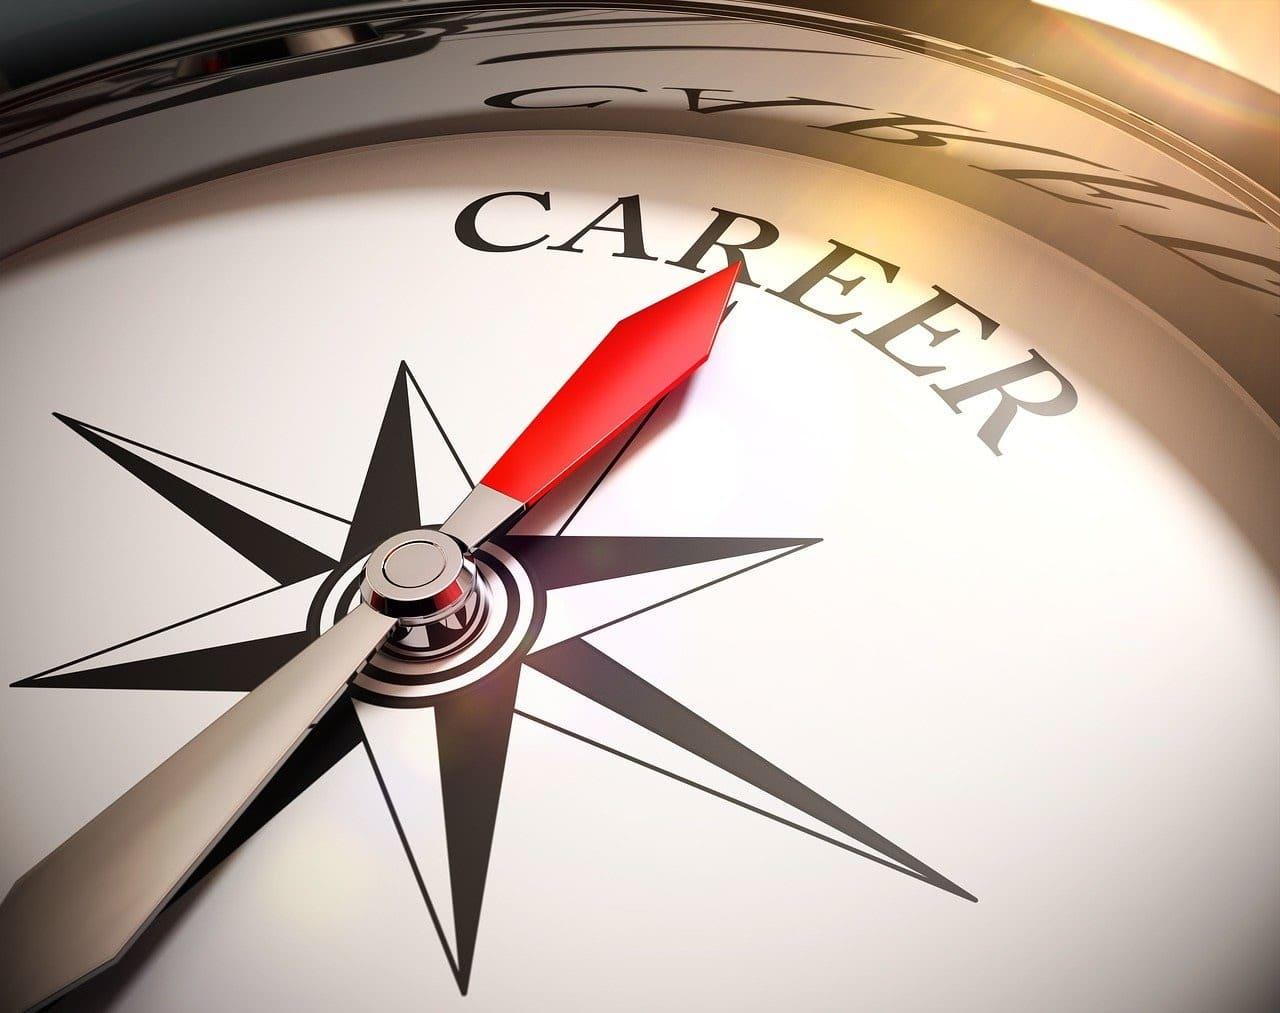 5 Reasons Engineers Prefer Working for Staffing Agencies